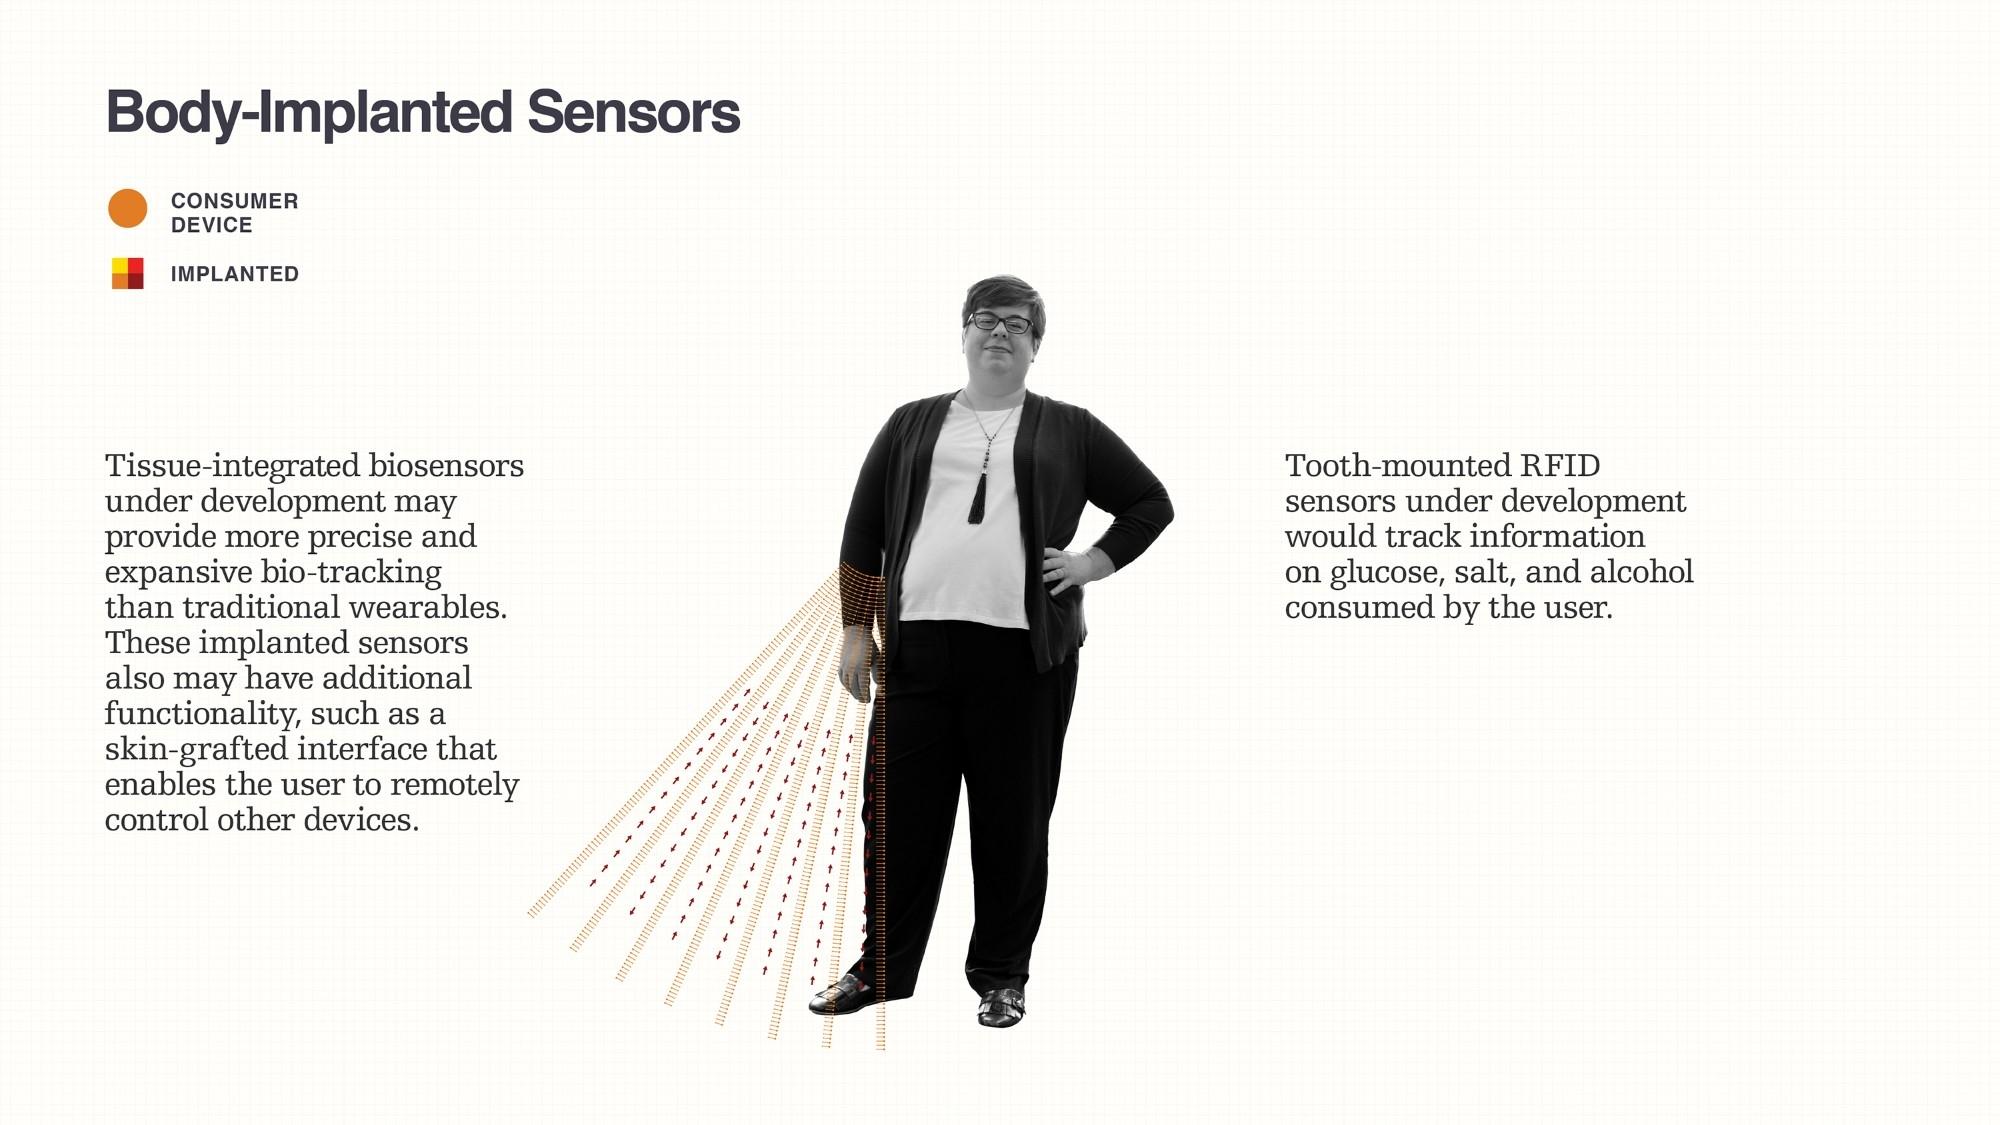 Data visualization illustrating body-implanted sensors by Gioriga Lupi.